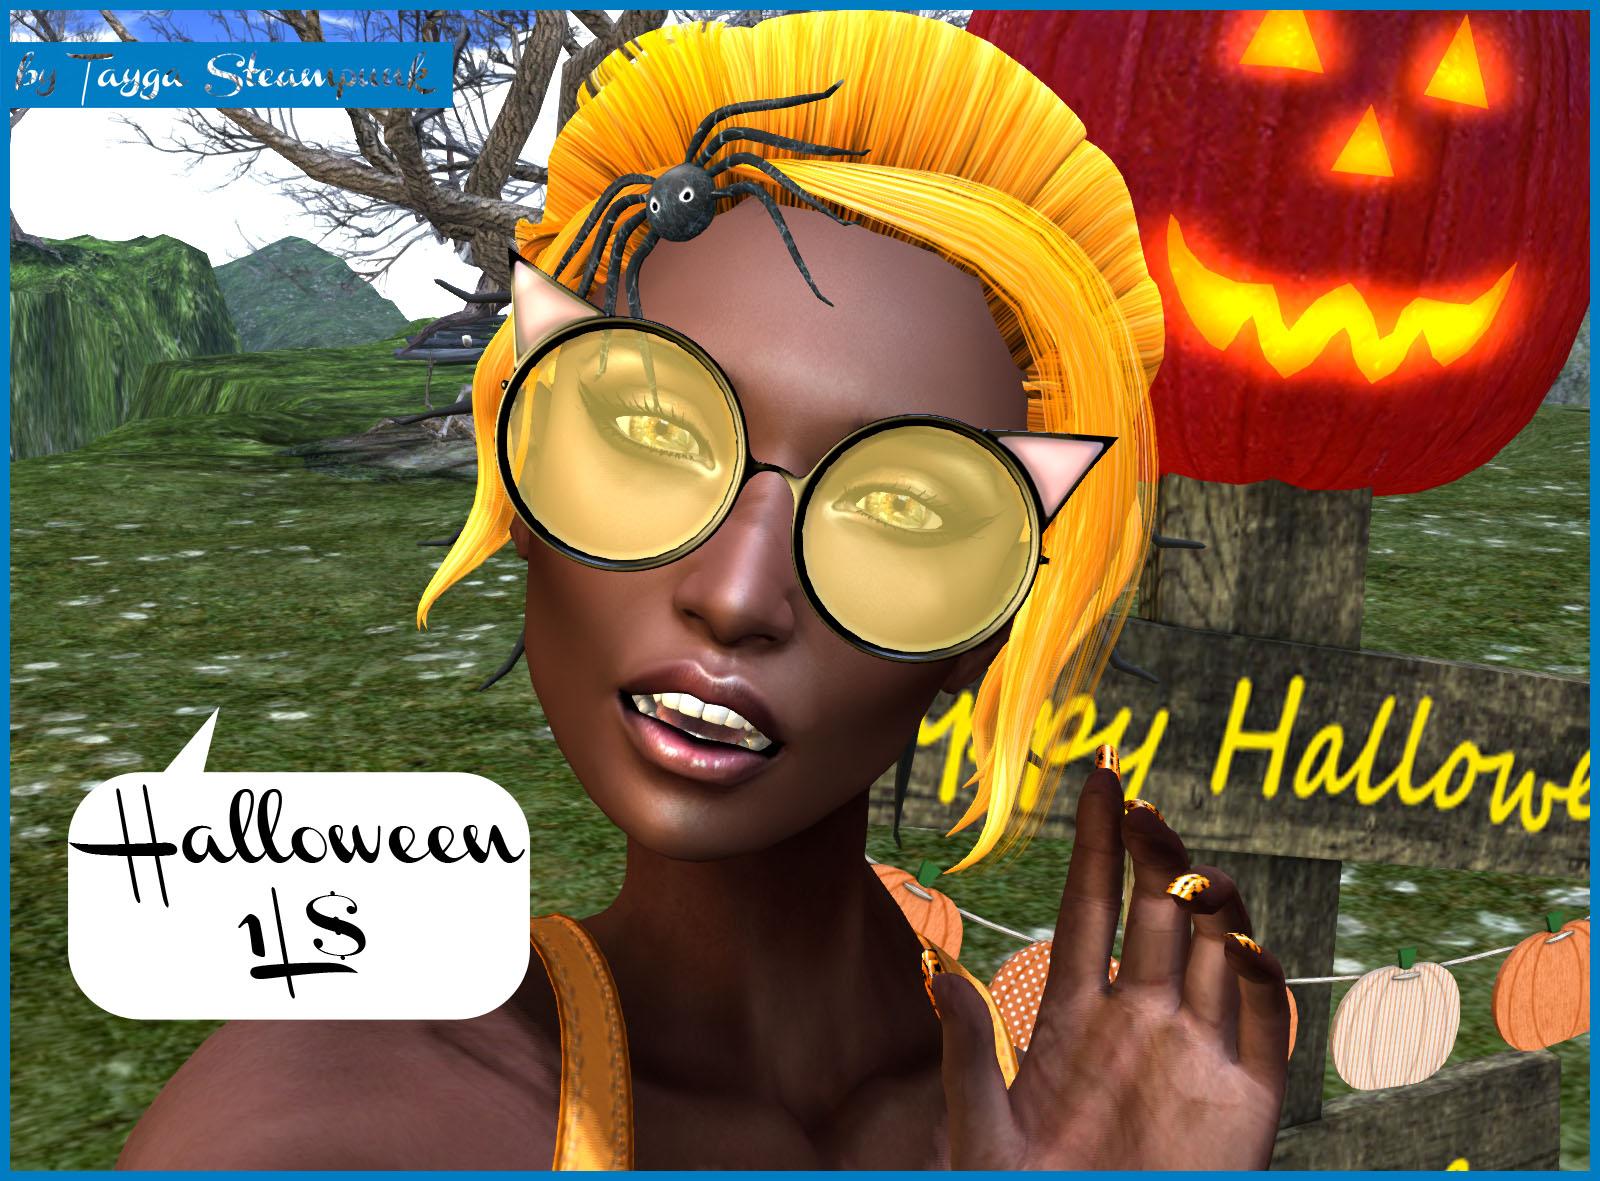 TS#7 Post Halloween